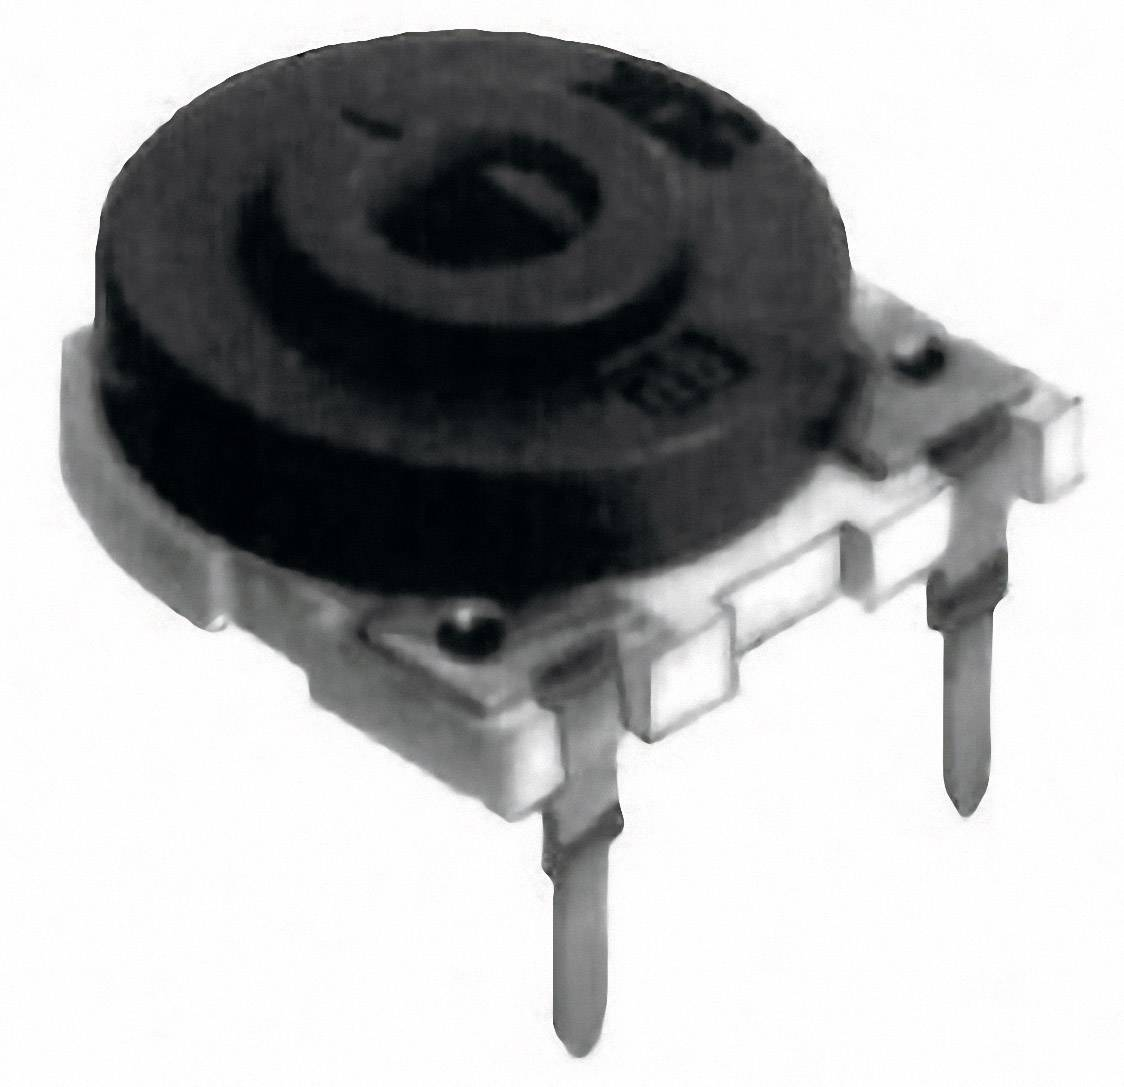 Cermetový trimer TT Electro, 2041460405, 220 Ω, 0.5 W, ± 20%